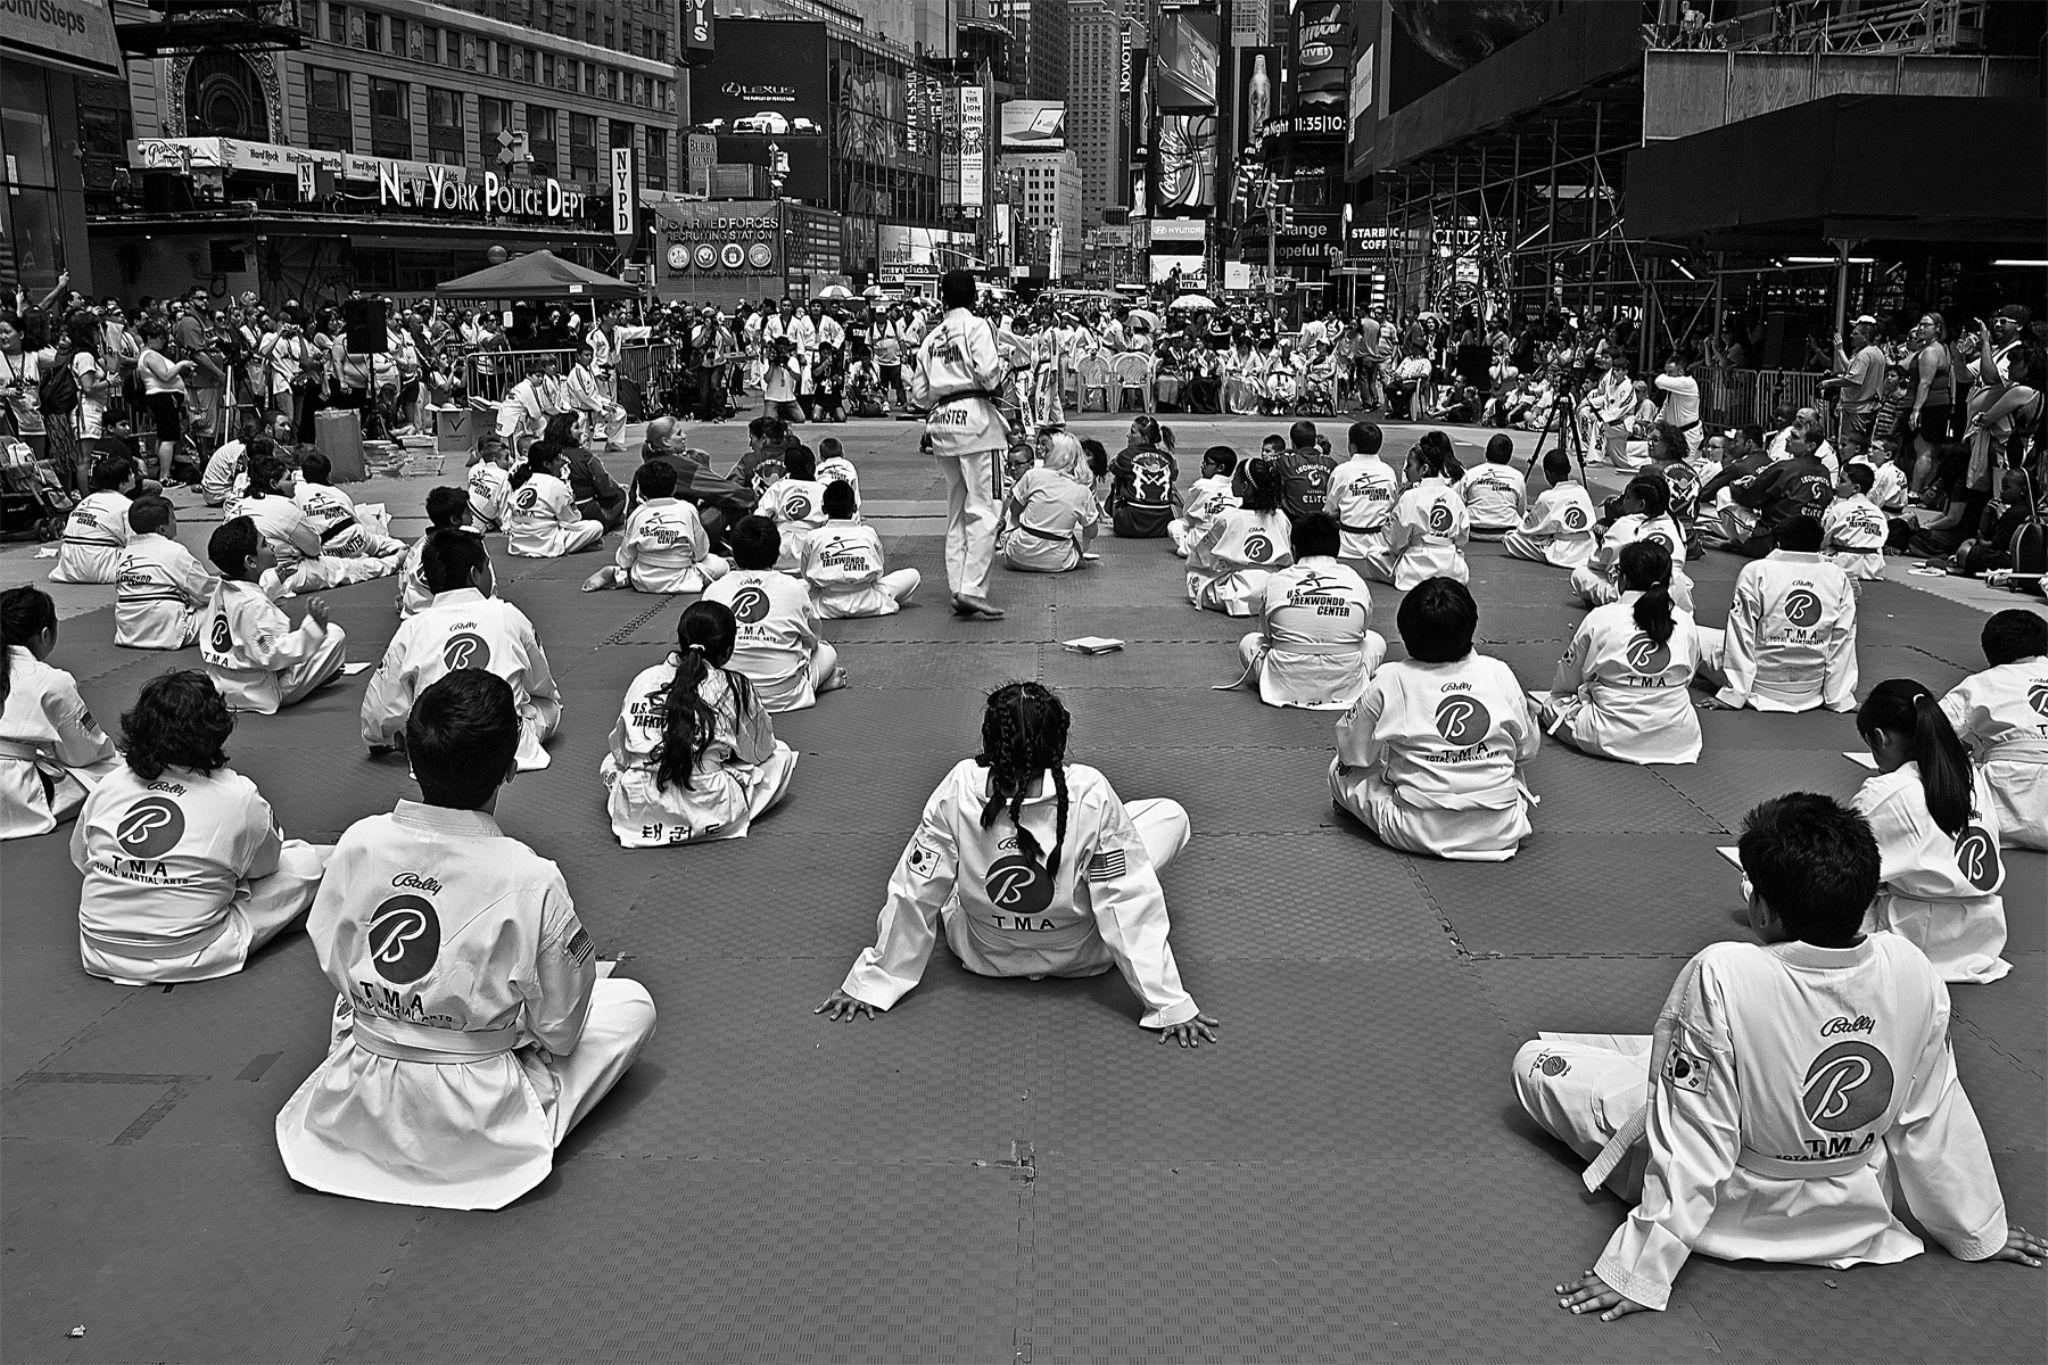 Taekwondocu Çocuklar ( Taekwondo Kids ) by Suleyman Bilgen